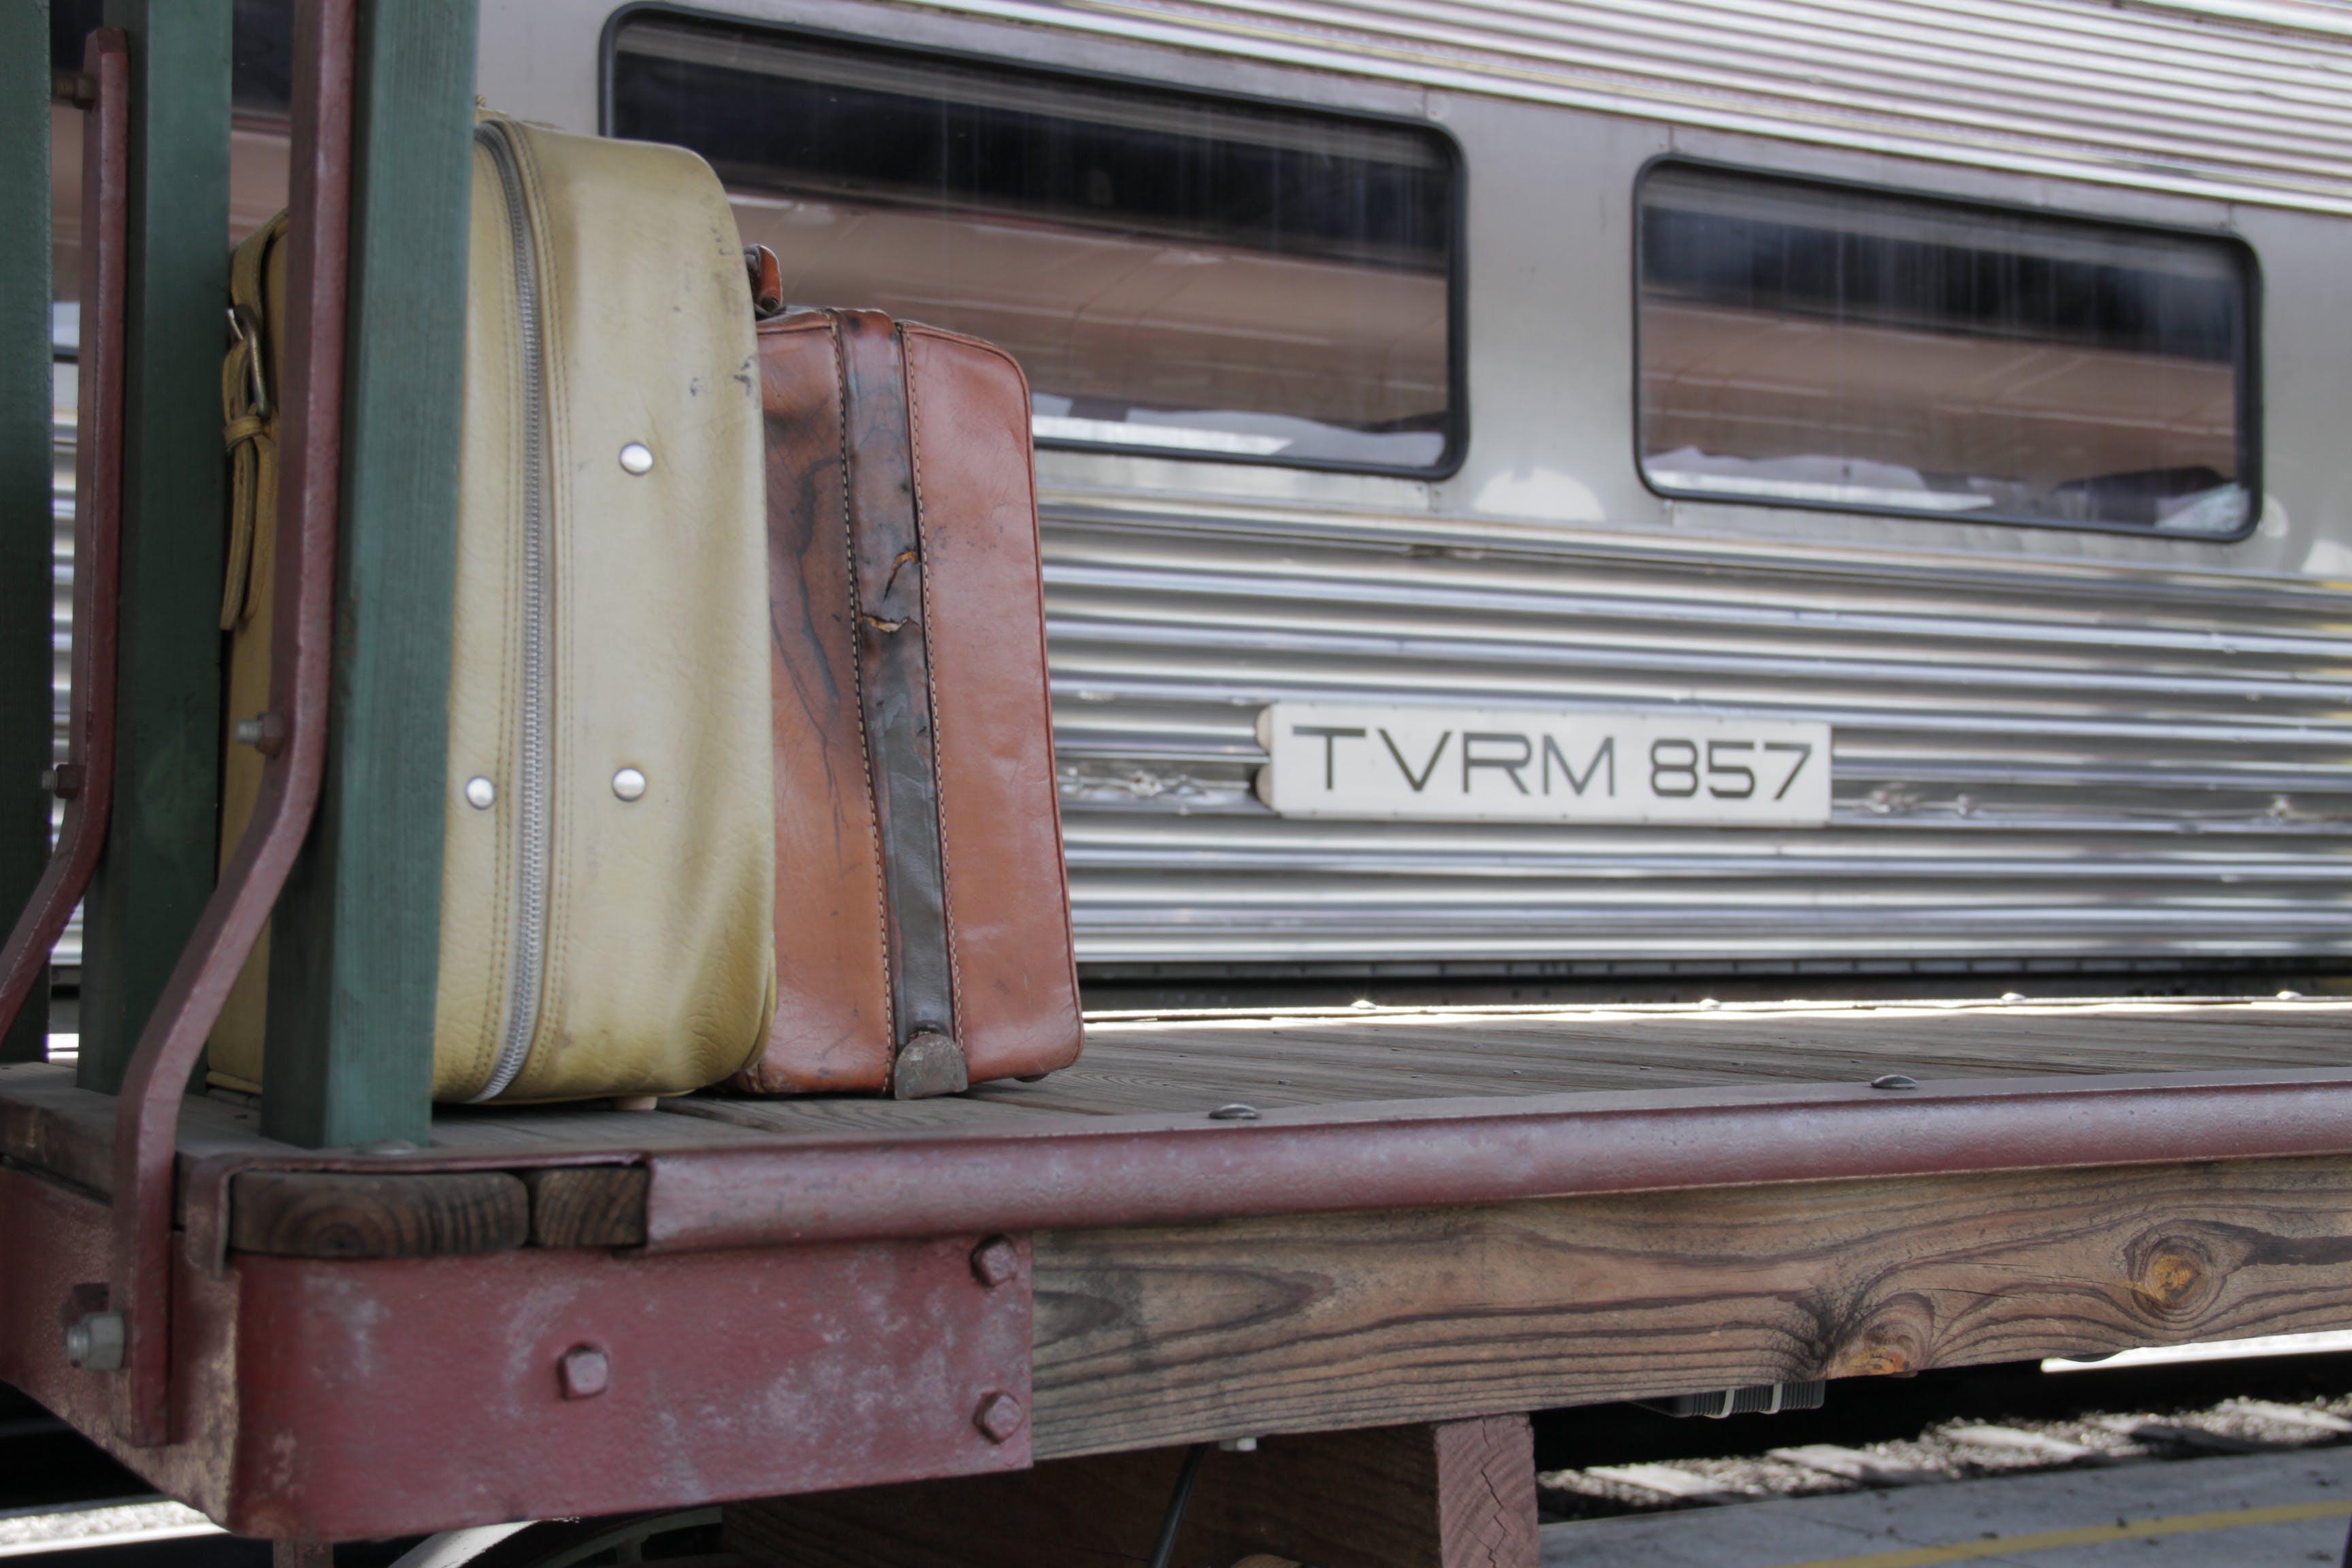 background, Chattanooga train depot, depot